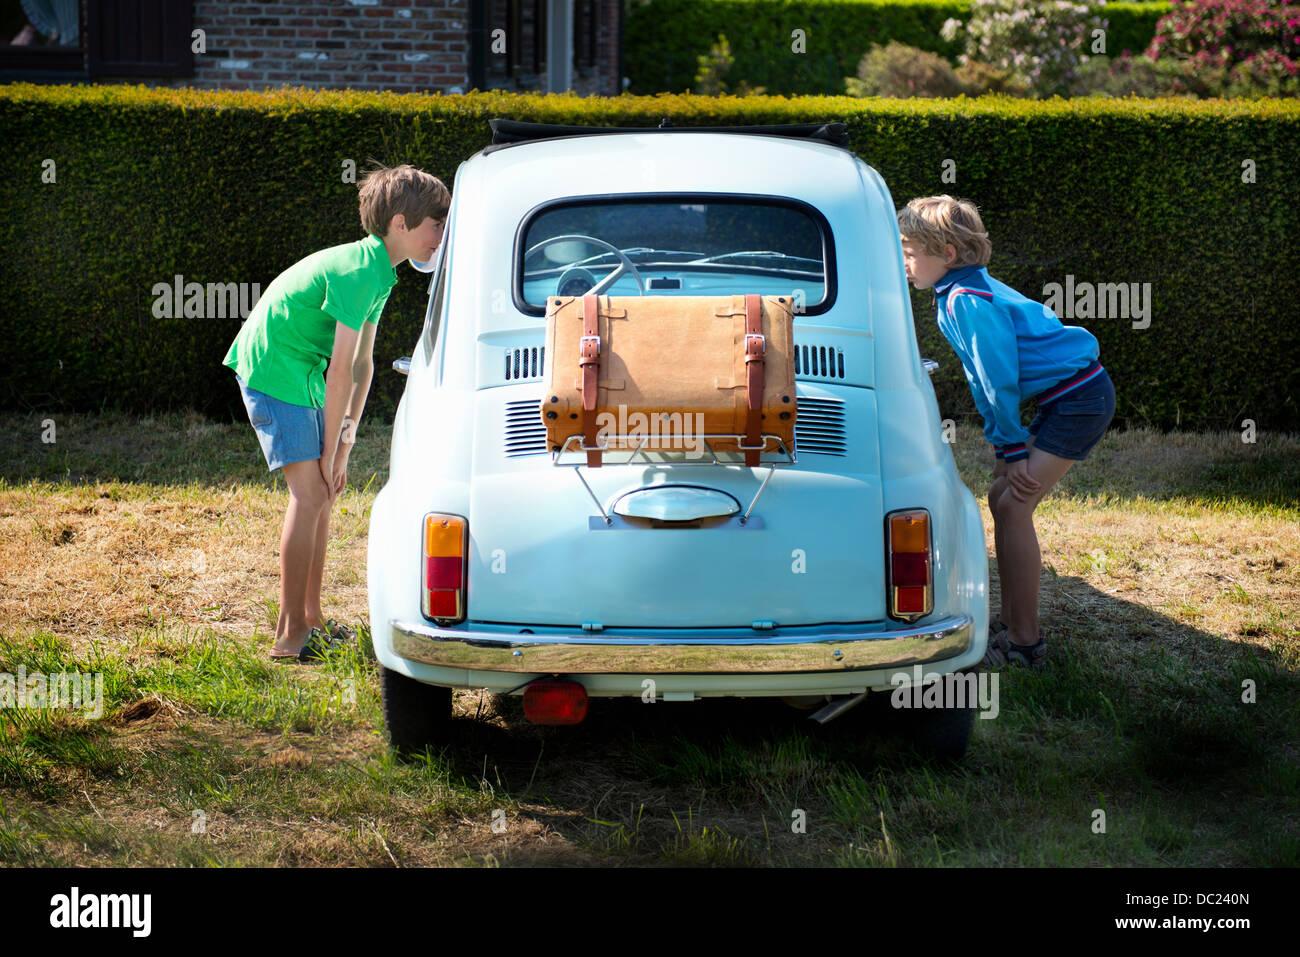 Boys looking through windows of vintage automobile - Stock Image